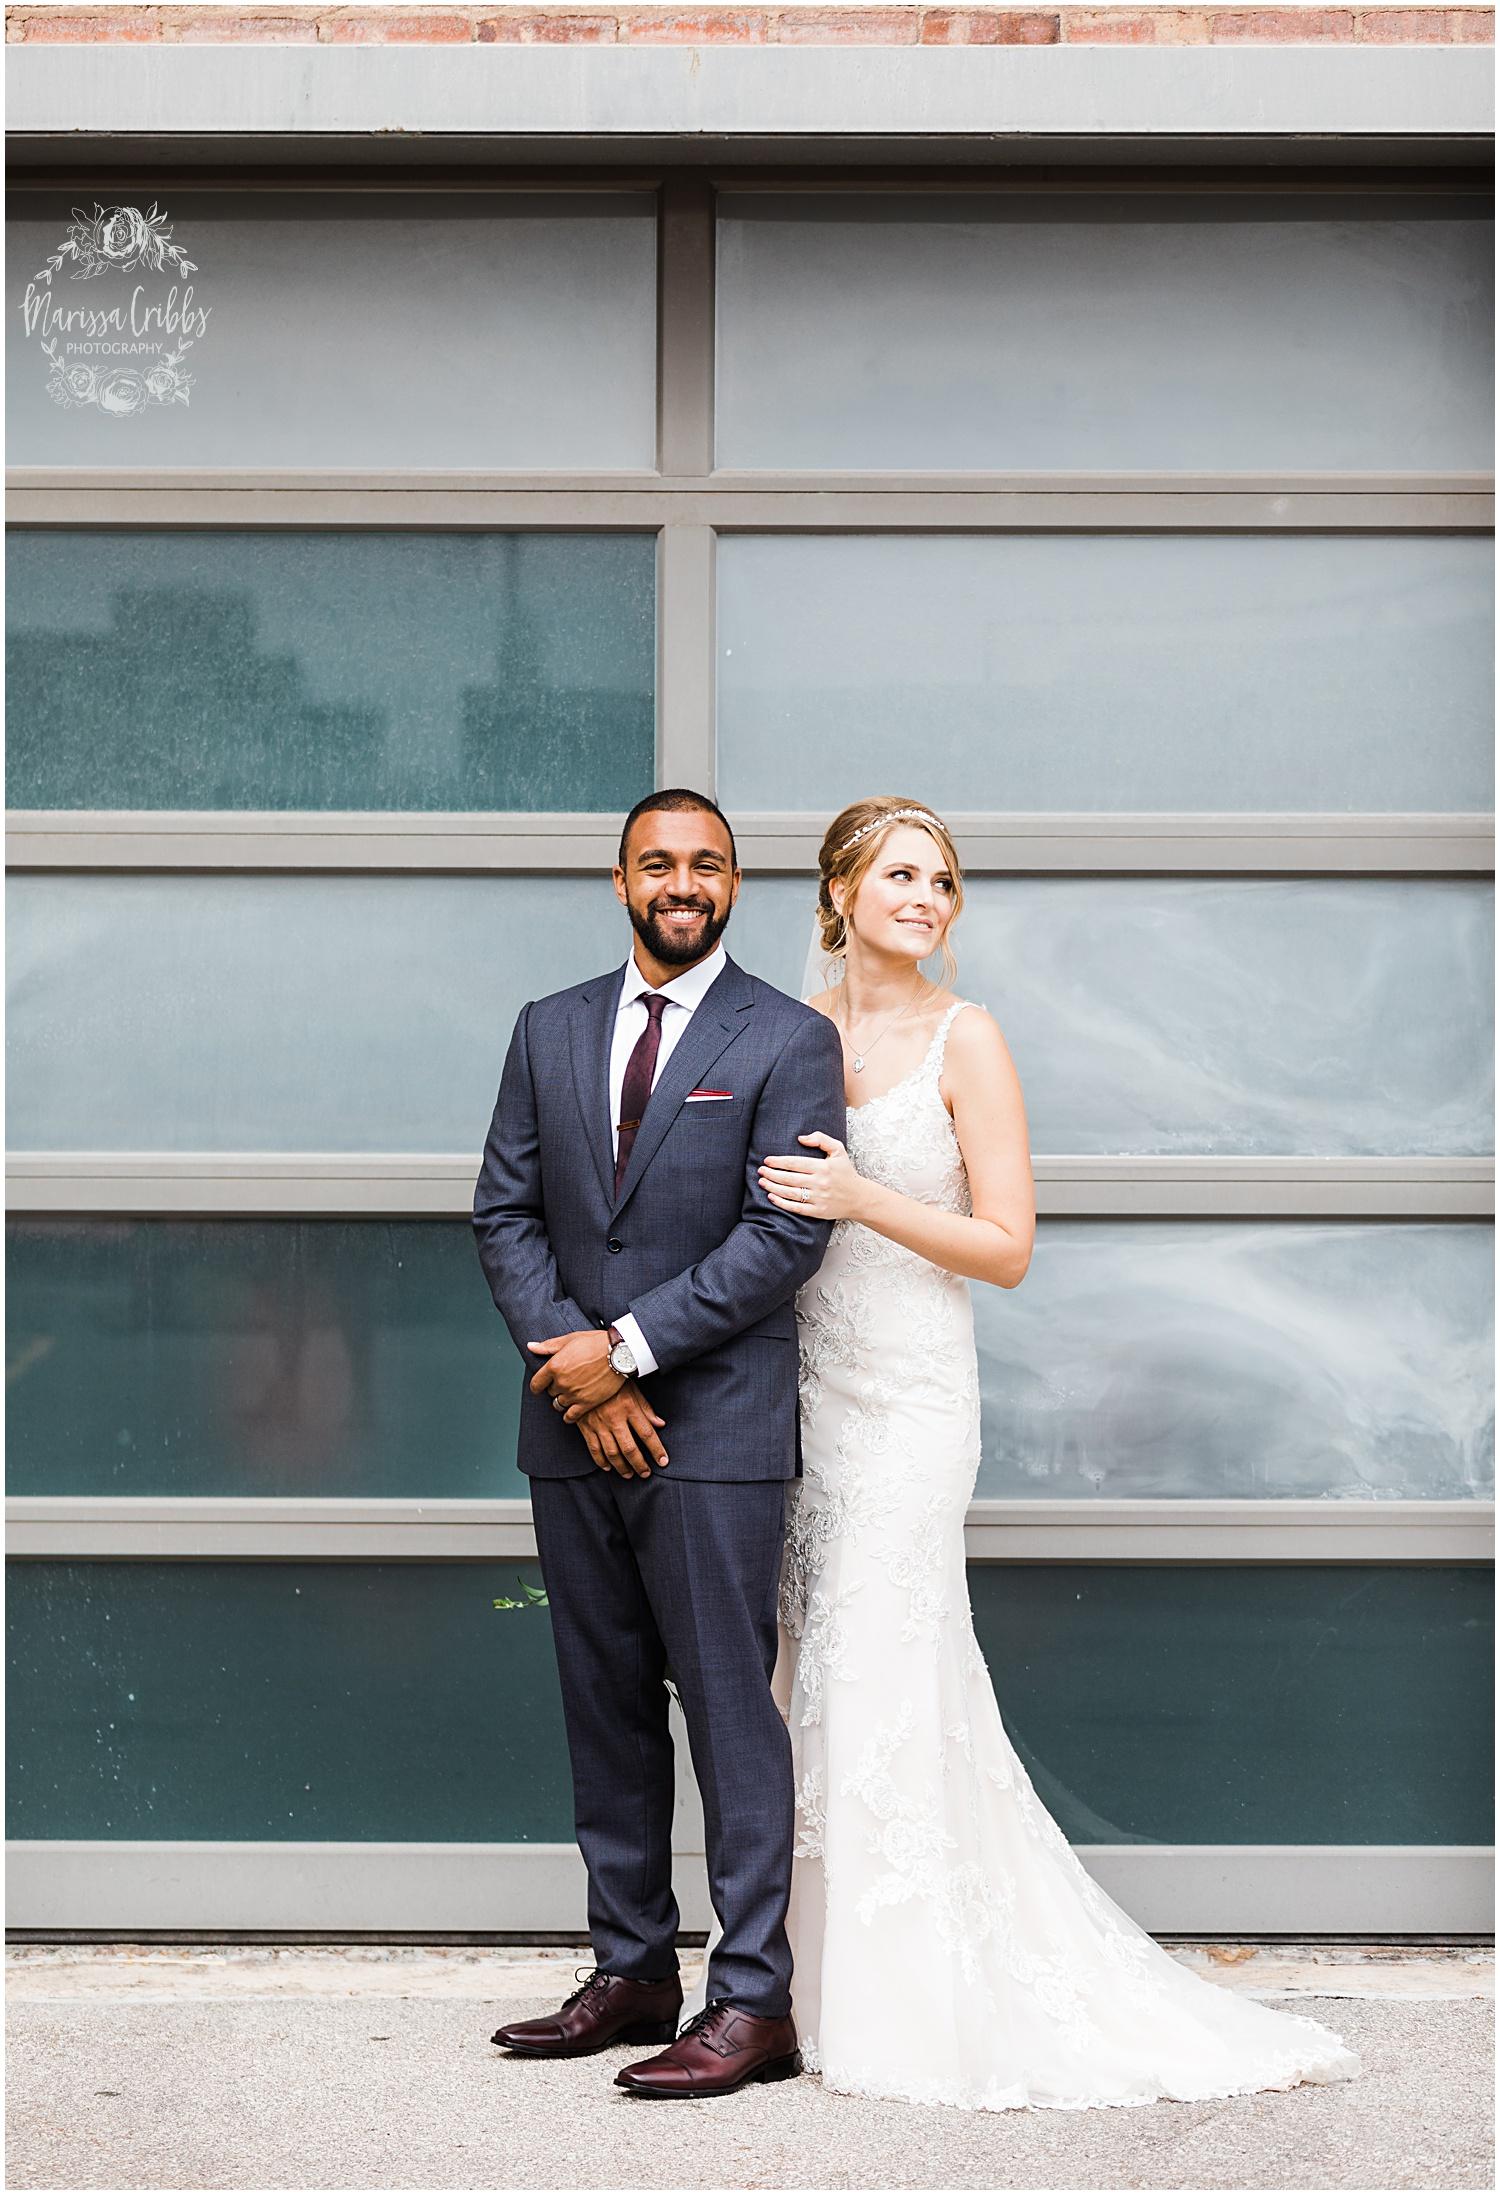 BAUER WEDDING   KELSEA & JUSTIN   MARISSA CRIBBS PHOTOGRAPHY_6533.jpg